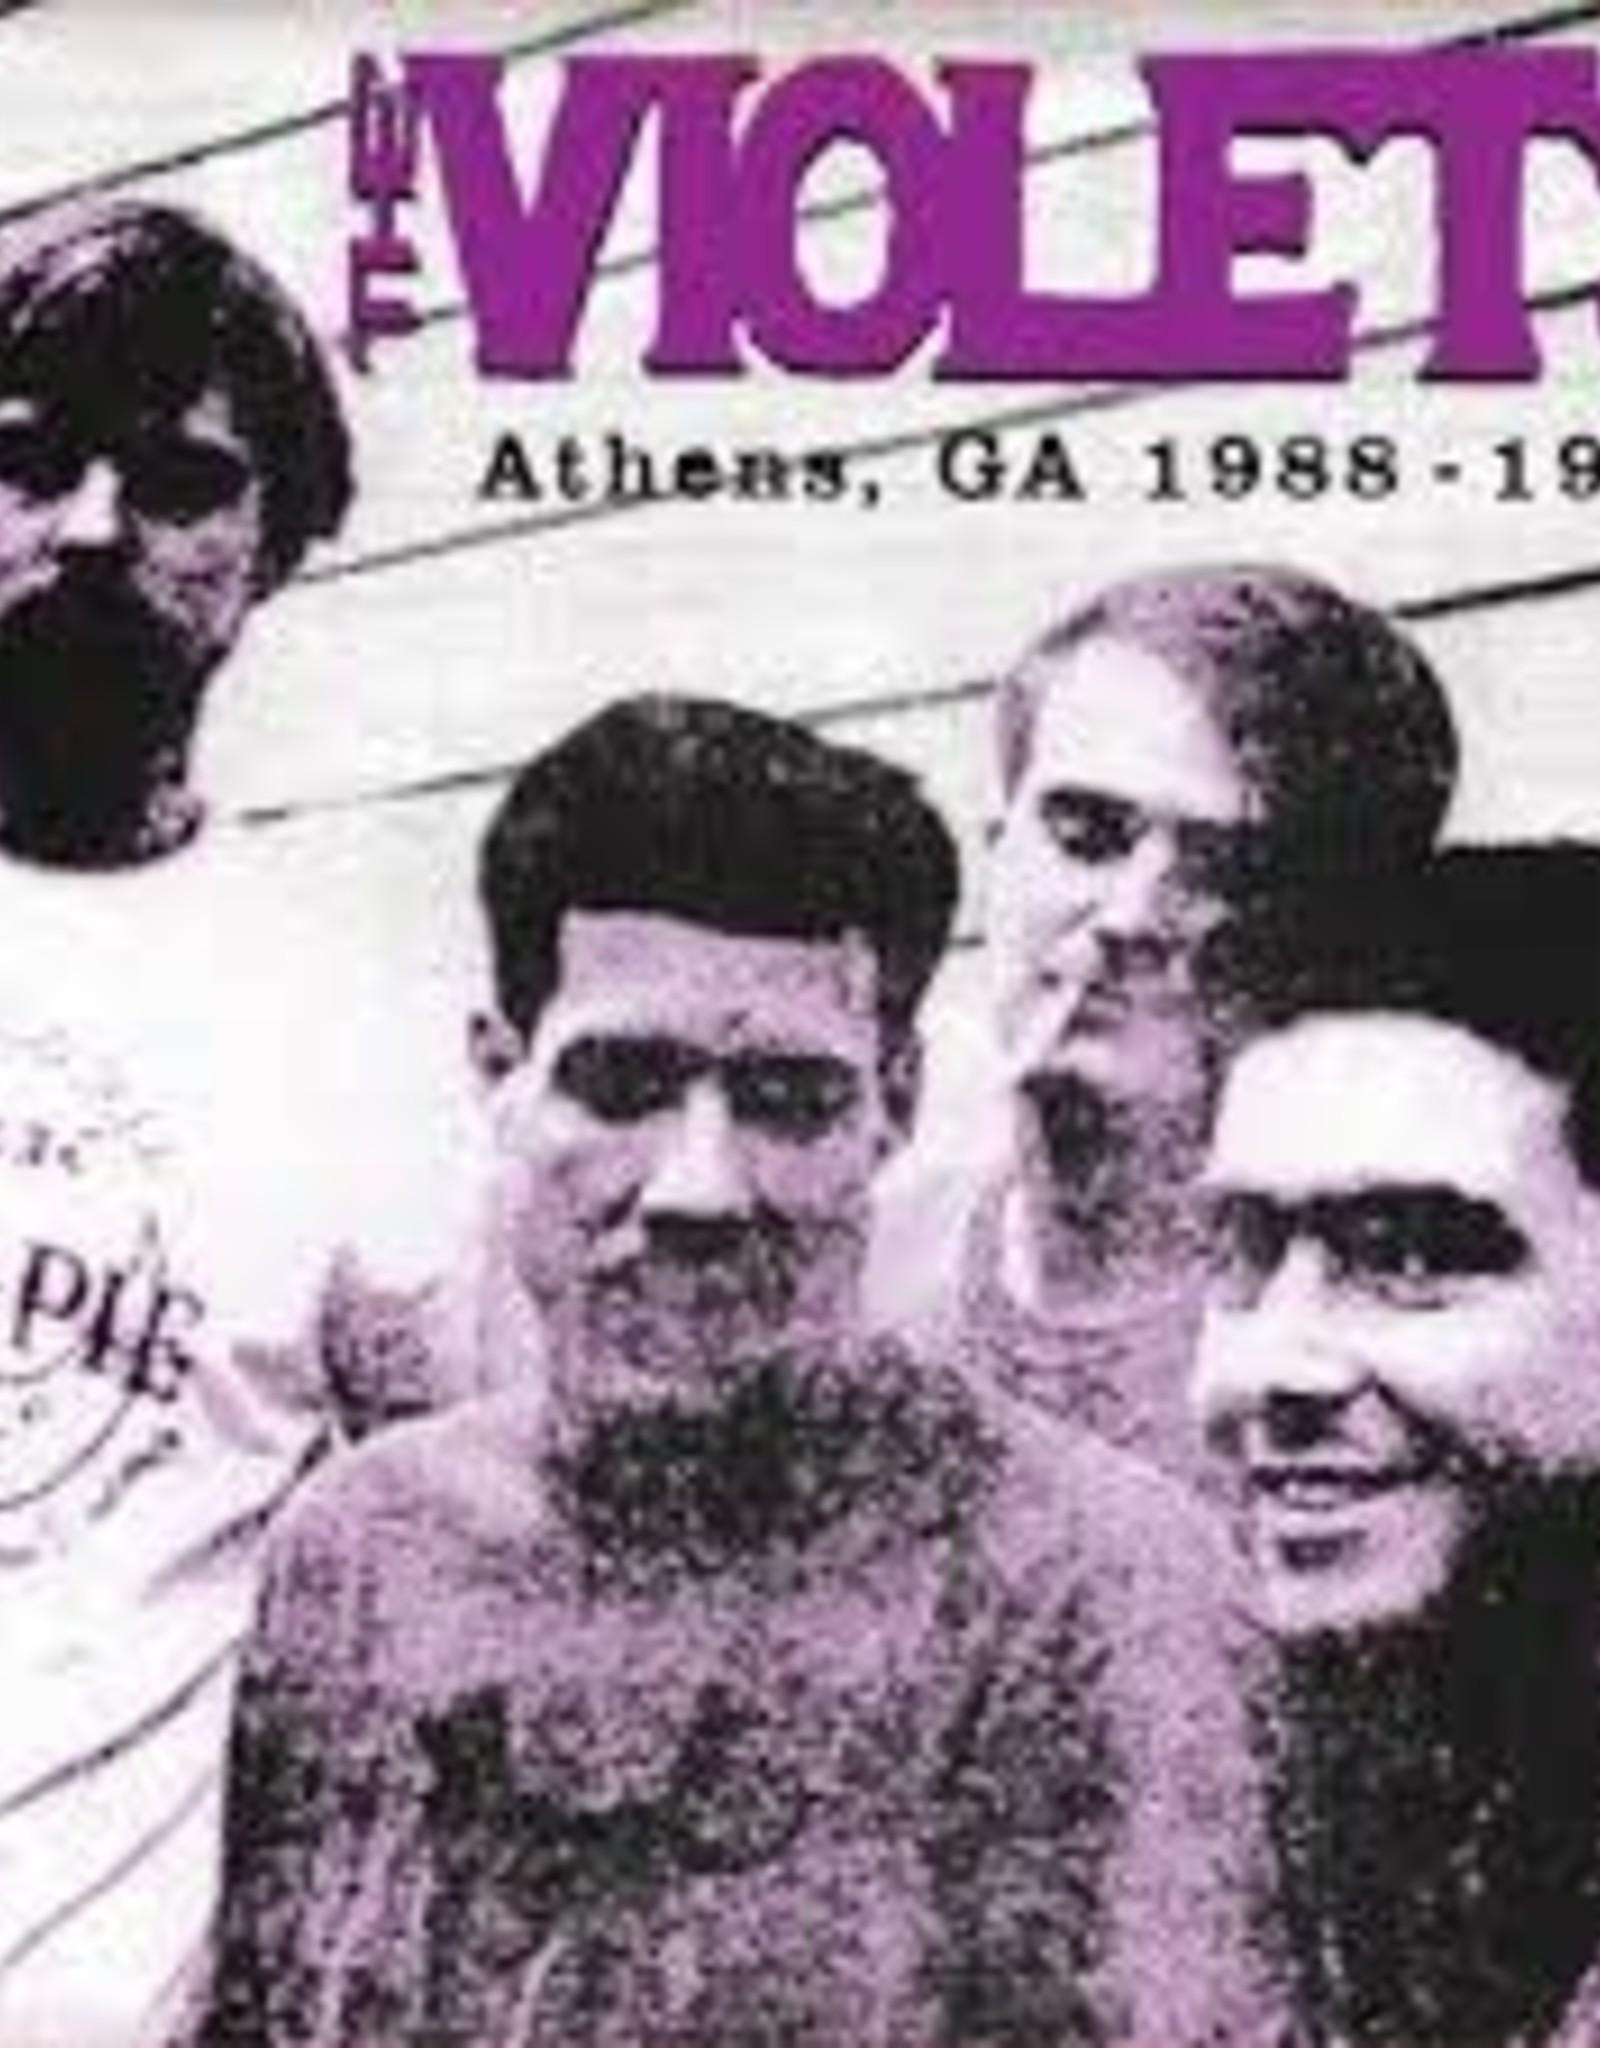 Violets - Athens Georgia 1988-1992 (Violet Vinyl/150G/Insert)  (RSD 2020)